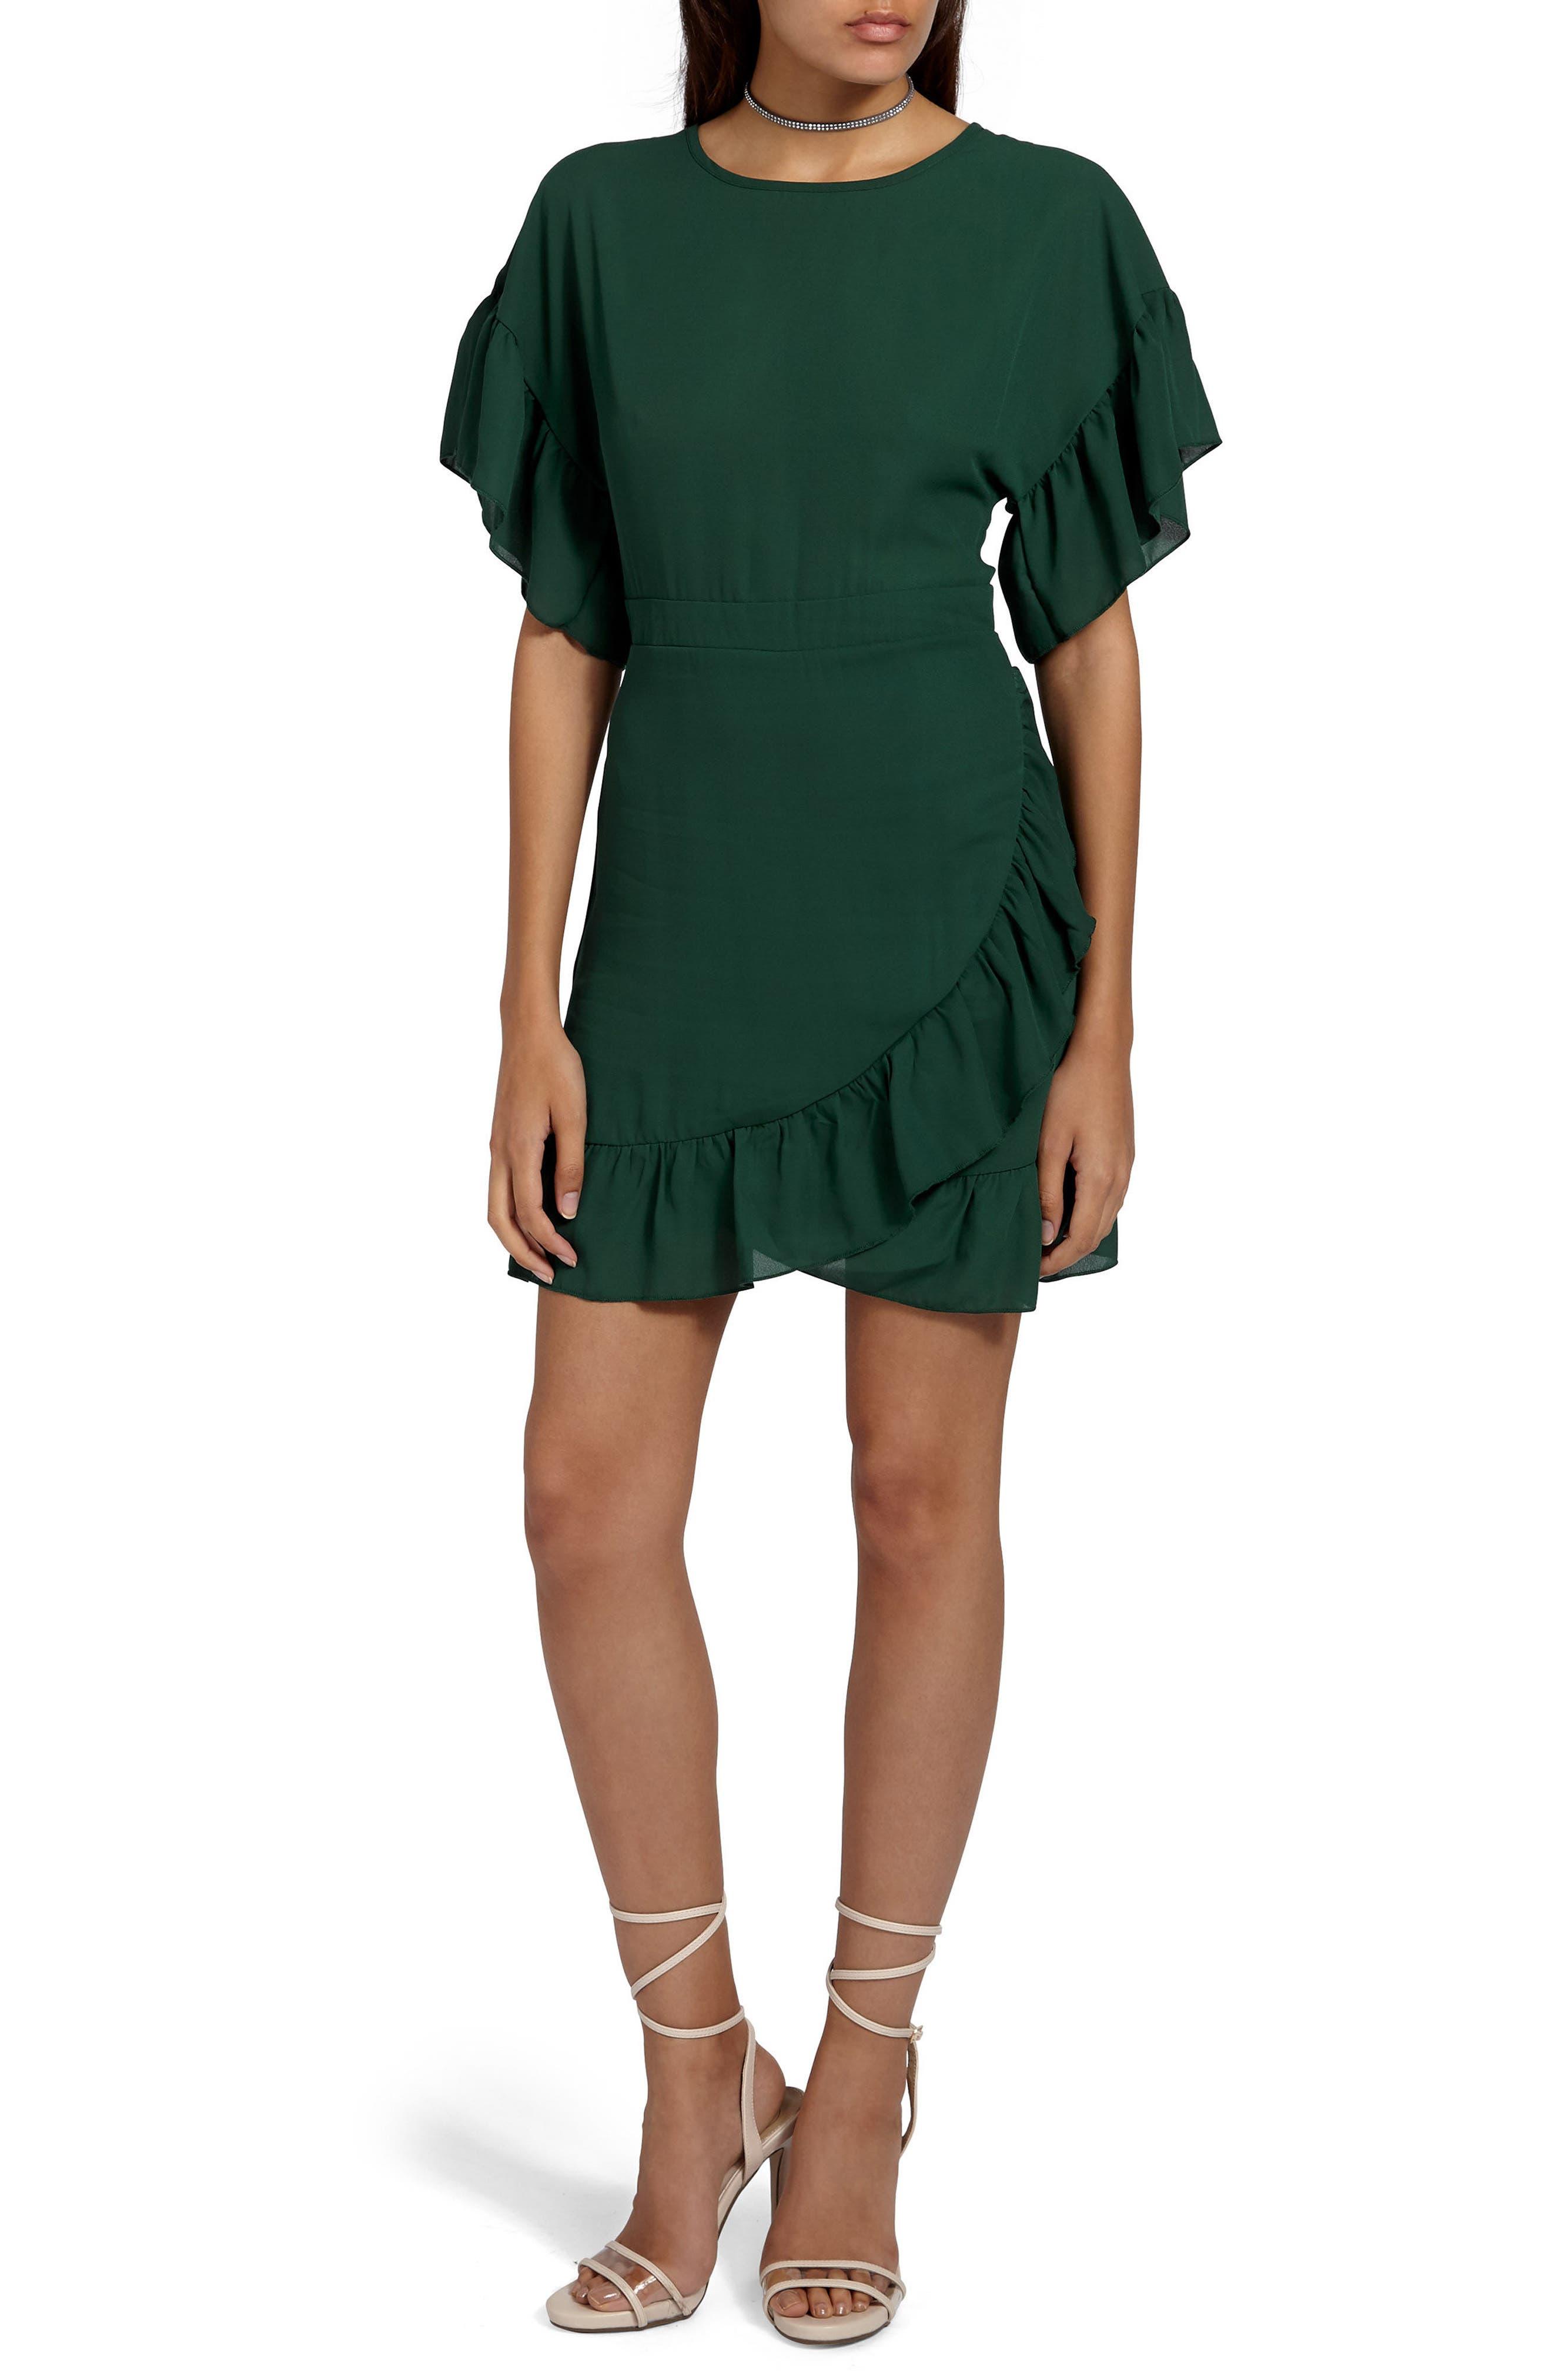 Ruffle Chiffon Sheath Dress,                             Main thumbnail 1, color,                             300